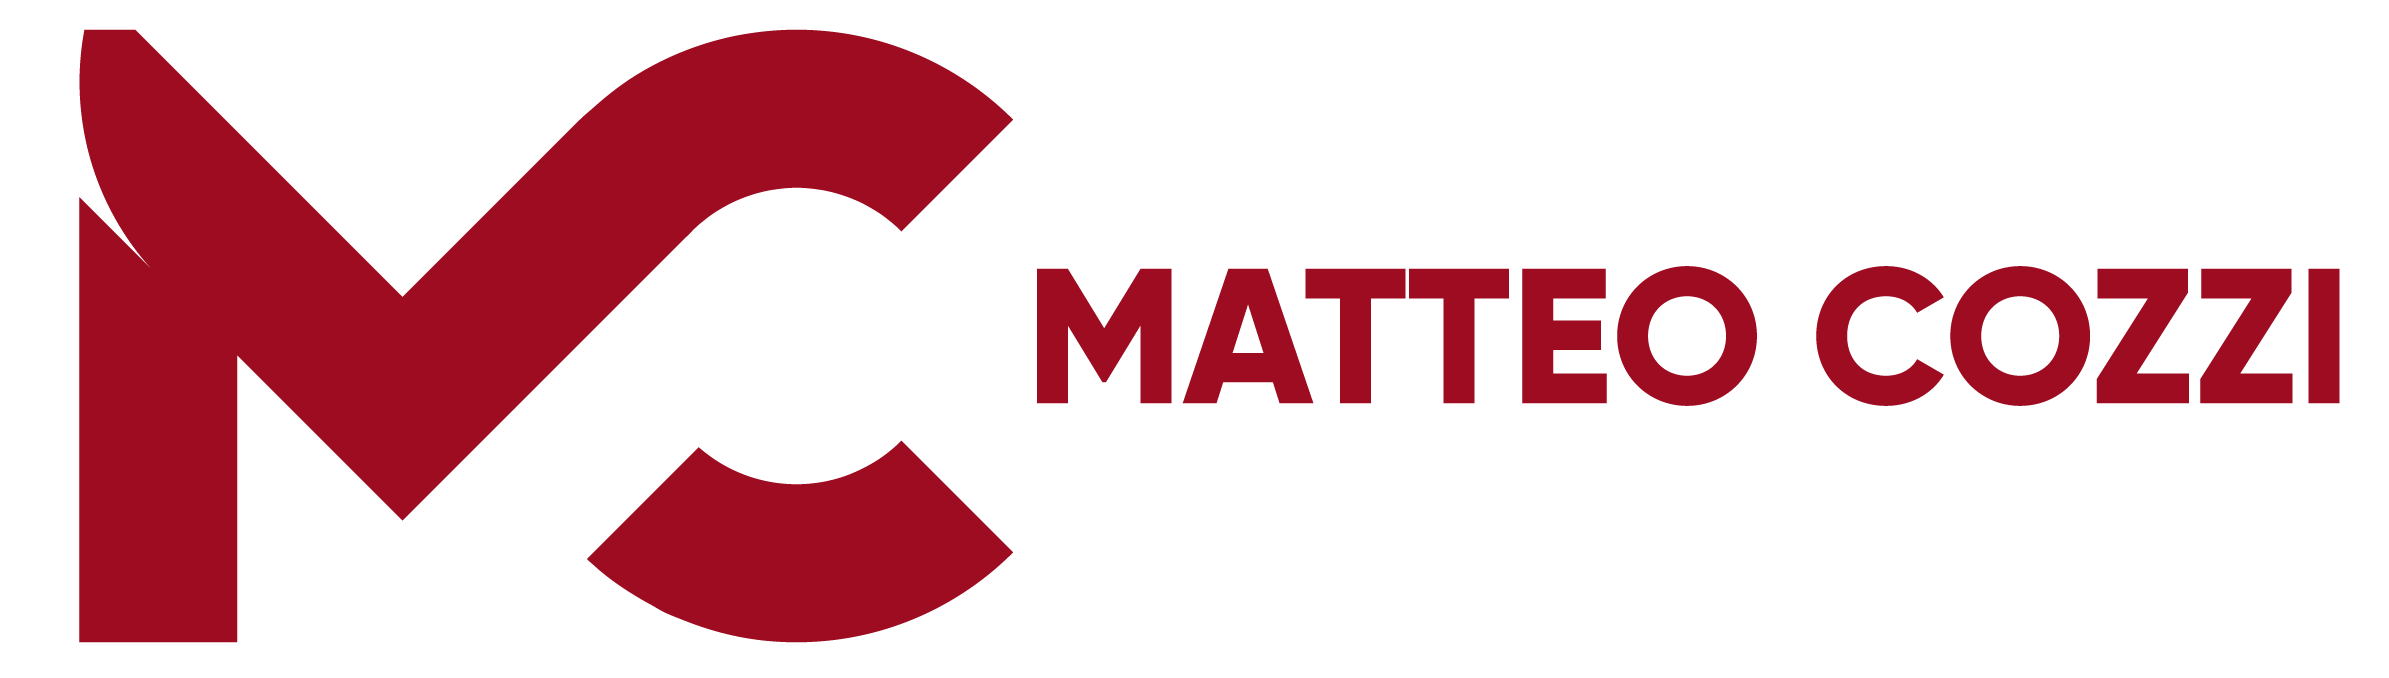 Matteo Cozzi